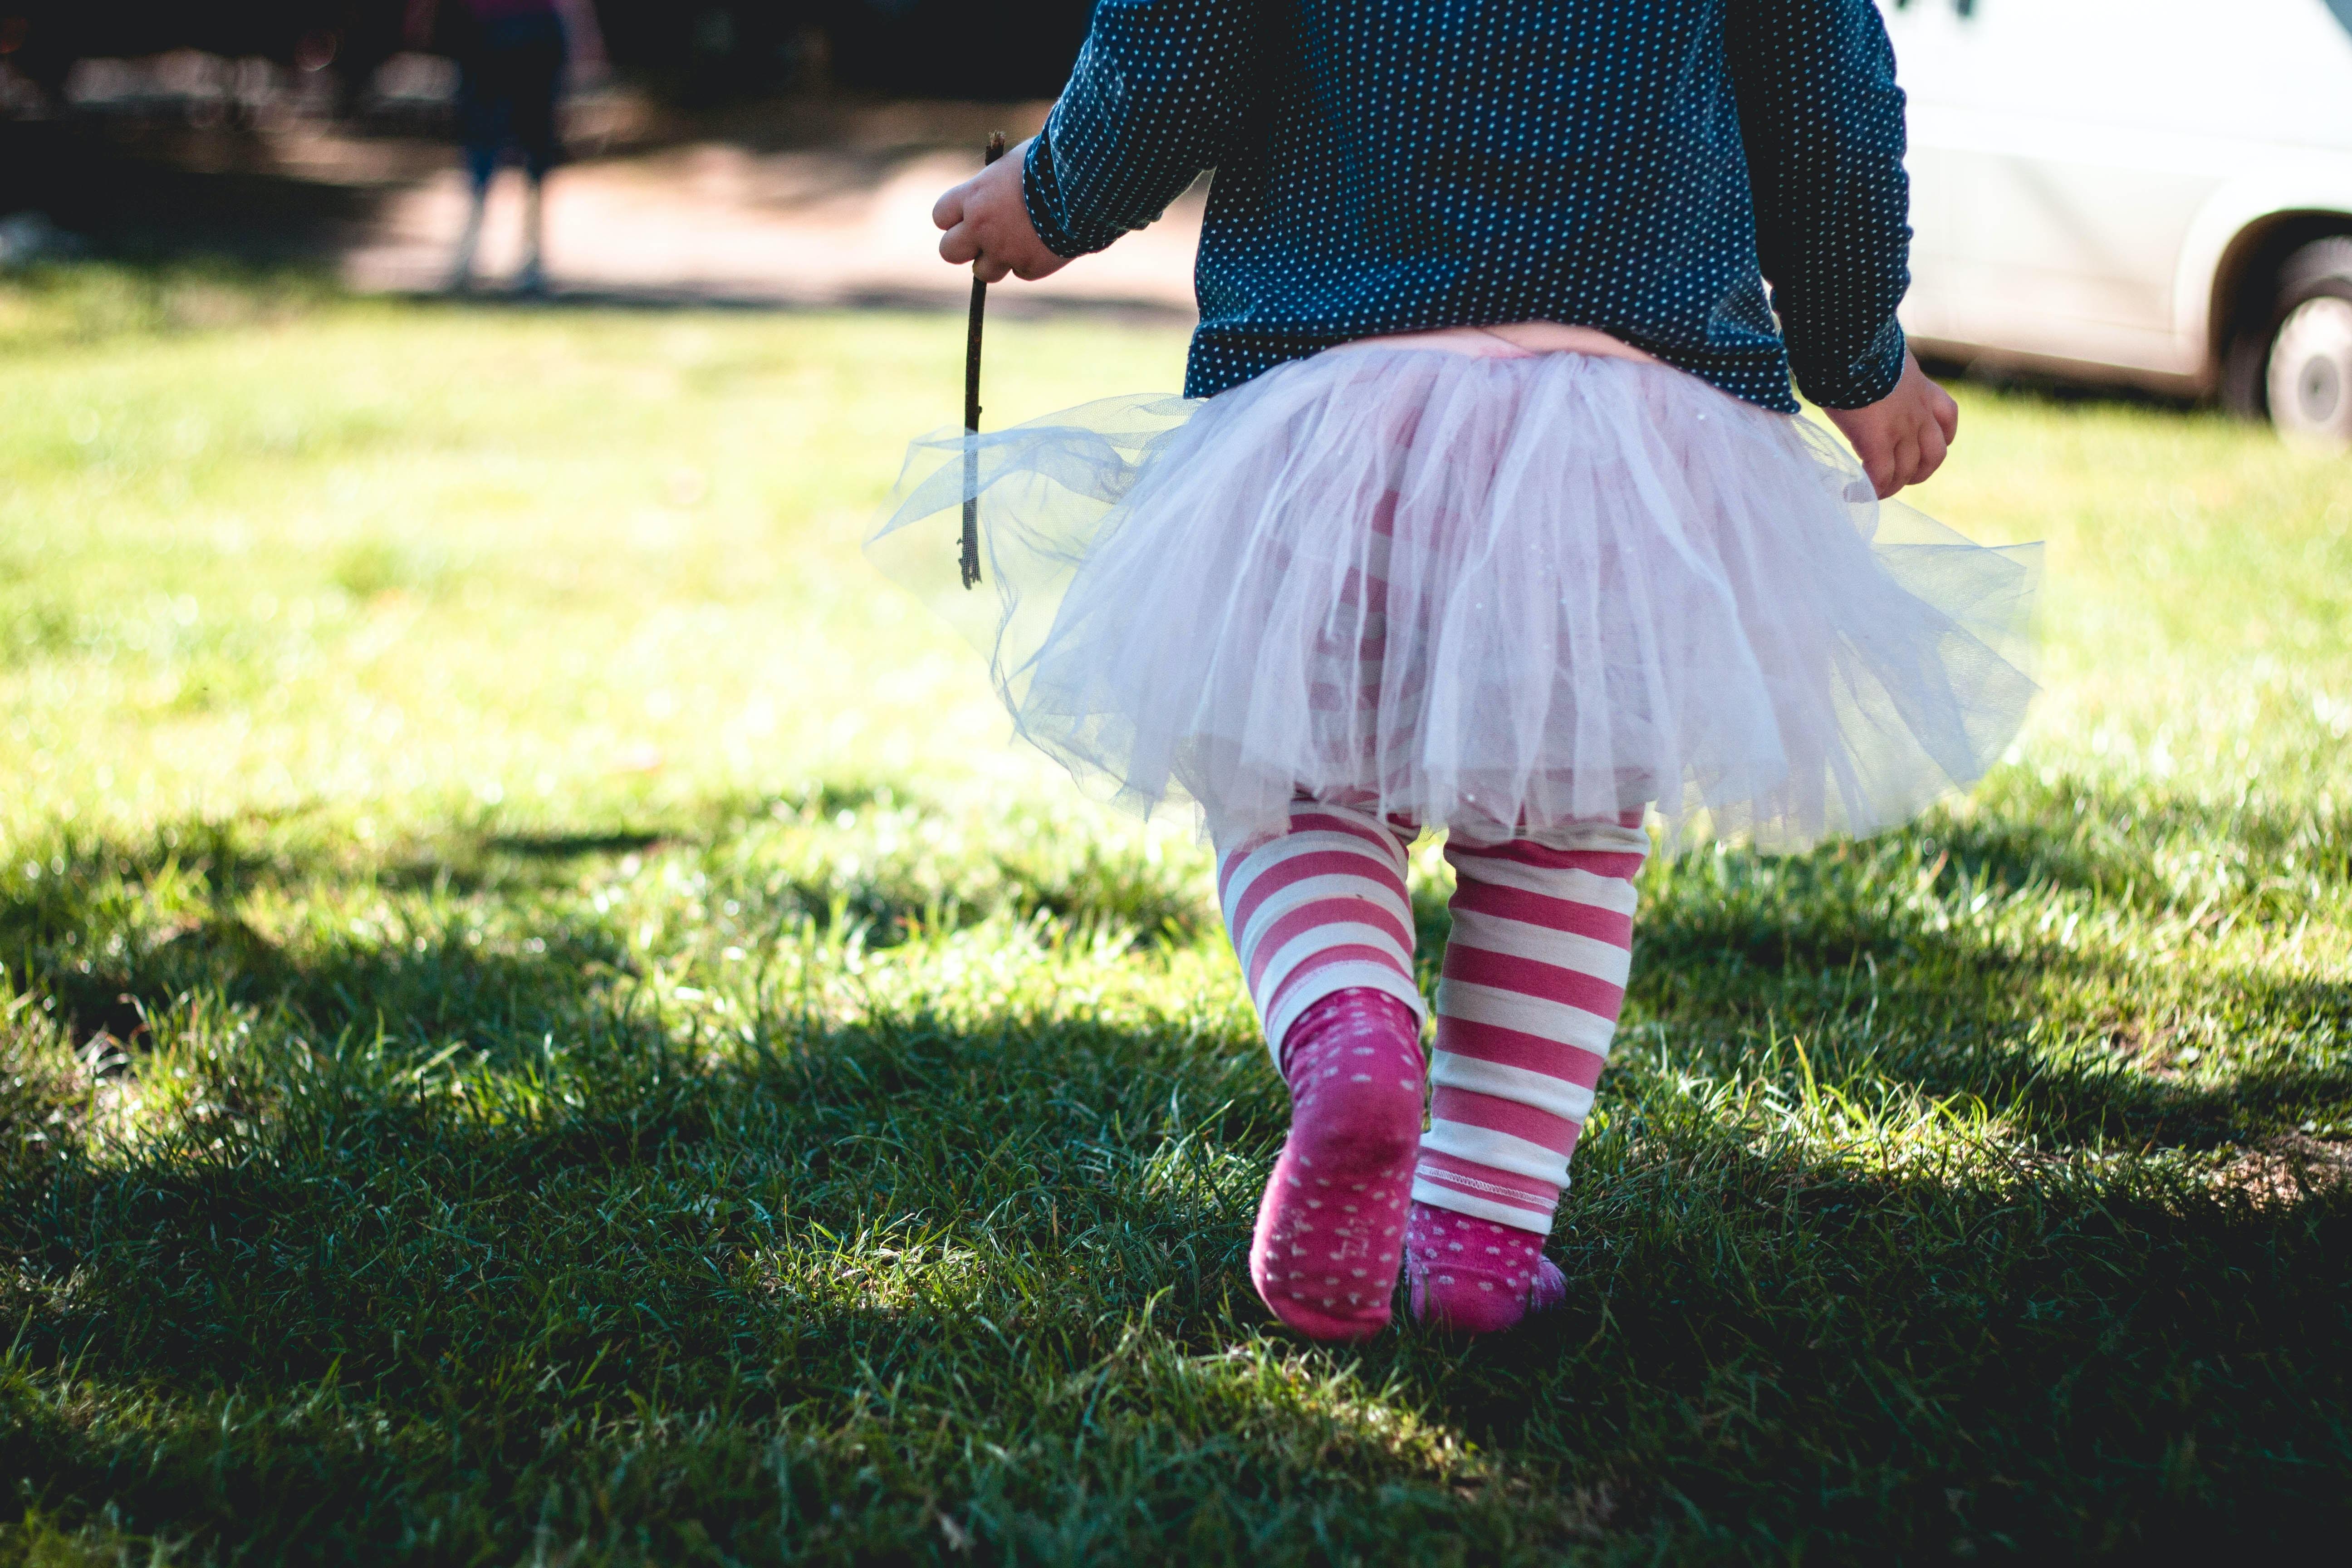 Female child wearing a tutu with stripe leggings walks on grass towards sunlight holding a stick